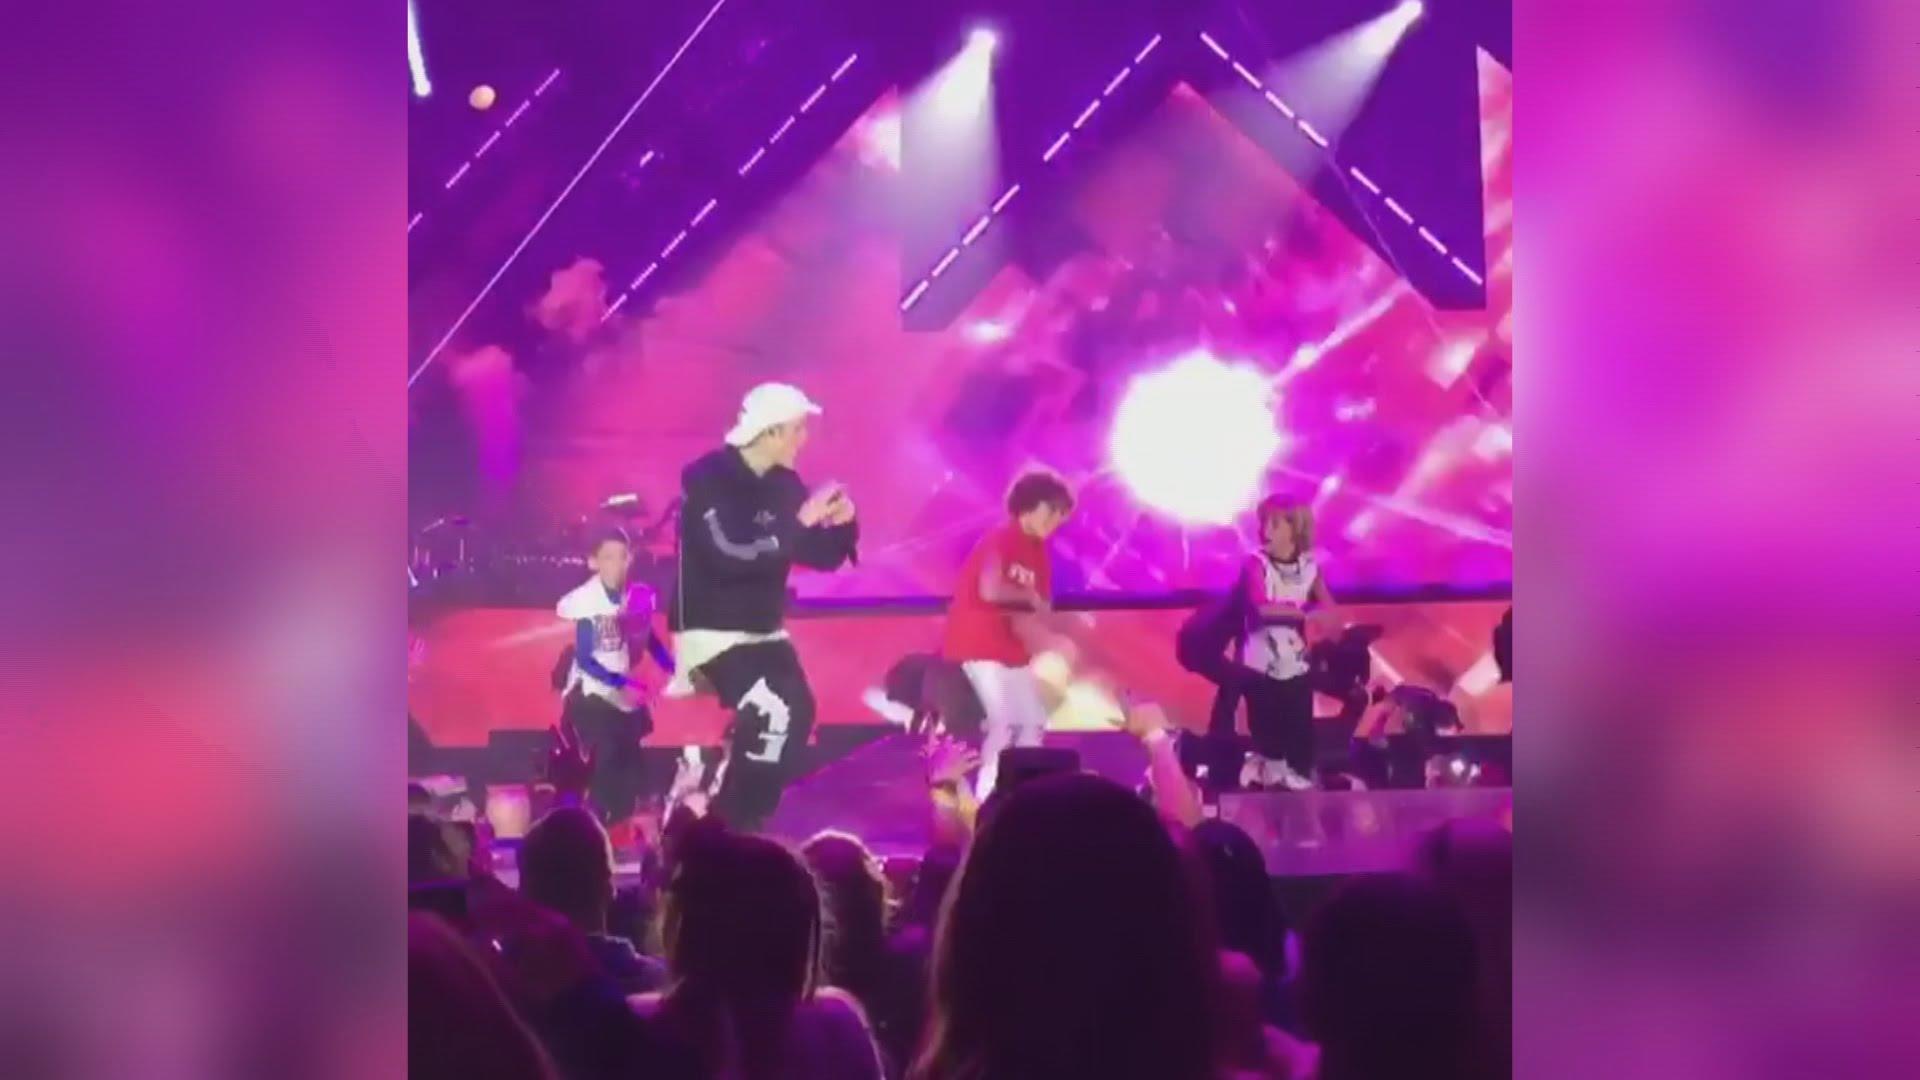 VIDEO: Mladi engleski b-boy nastupio na stageu s Justinom Bieberom